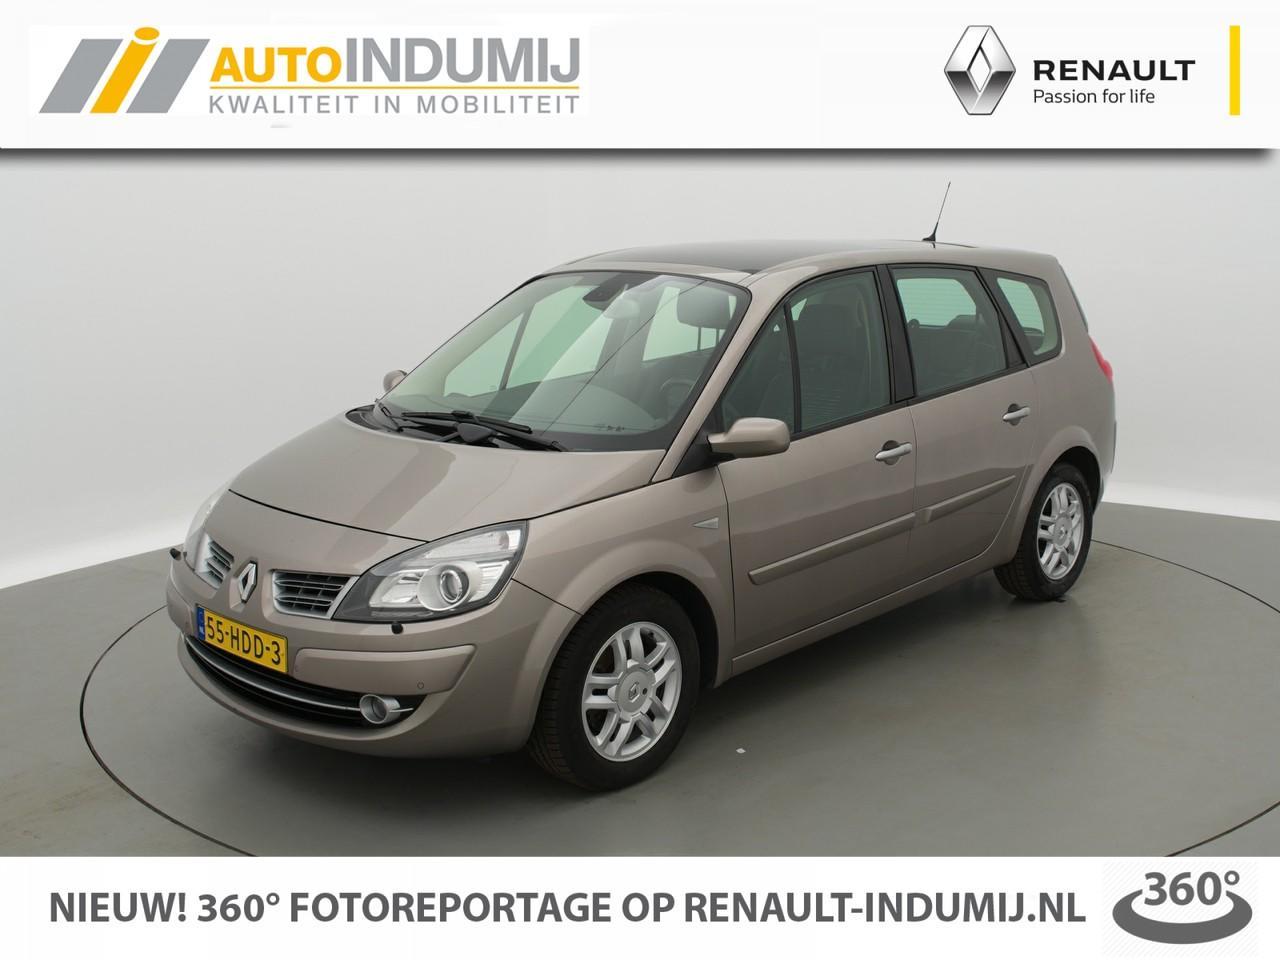 Renault Grand scénic 2.0-16v tech line  // panoramadak // climate // trekhaak // navi